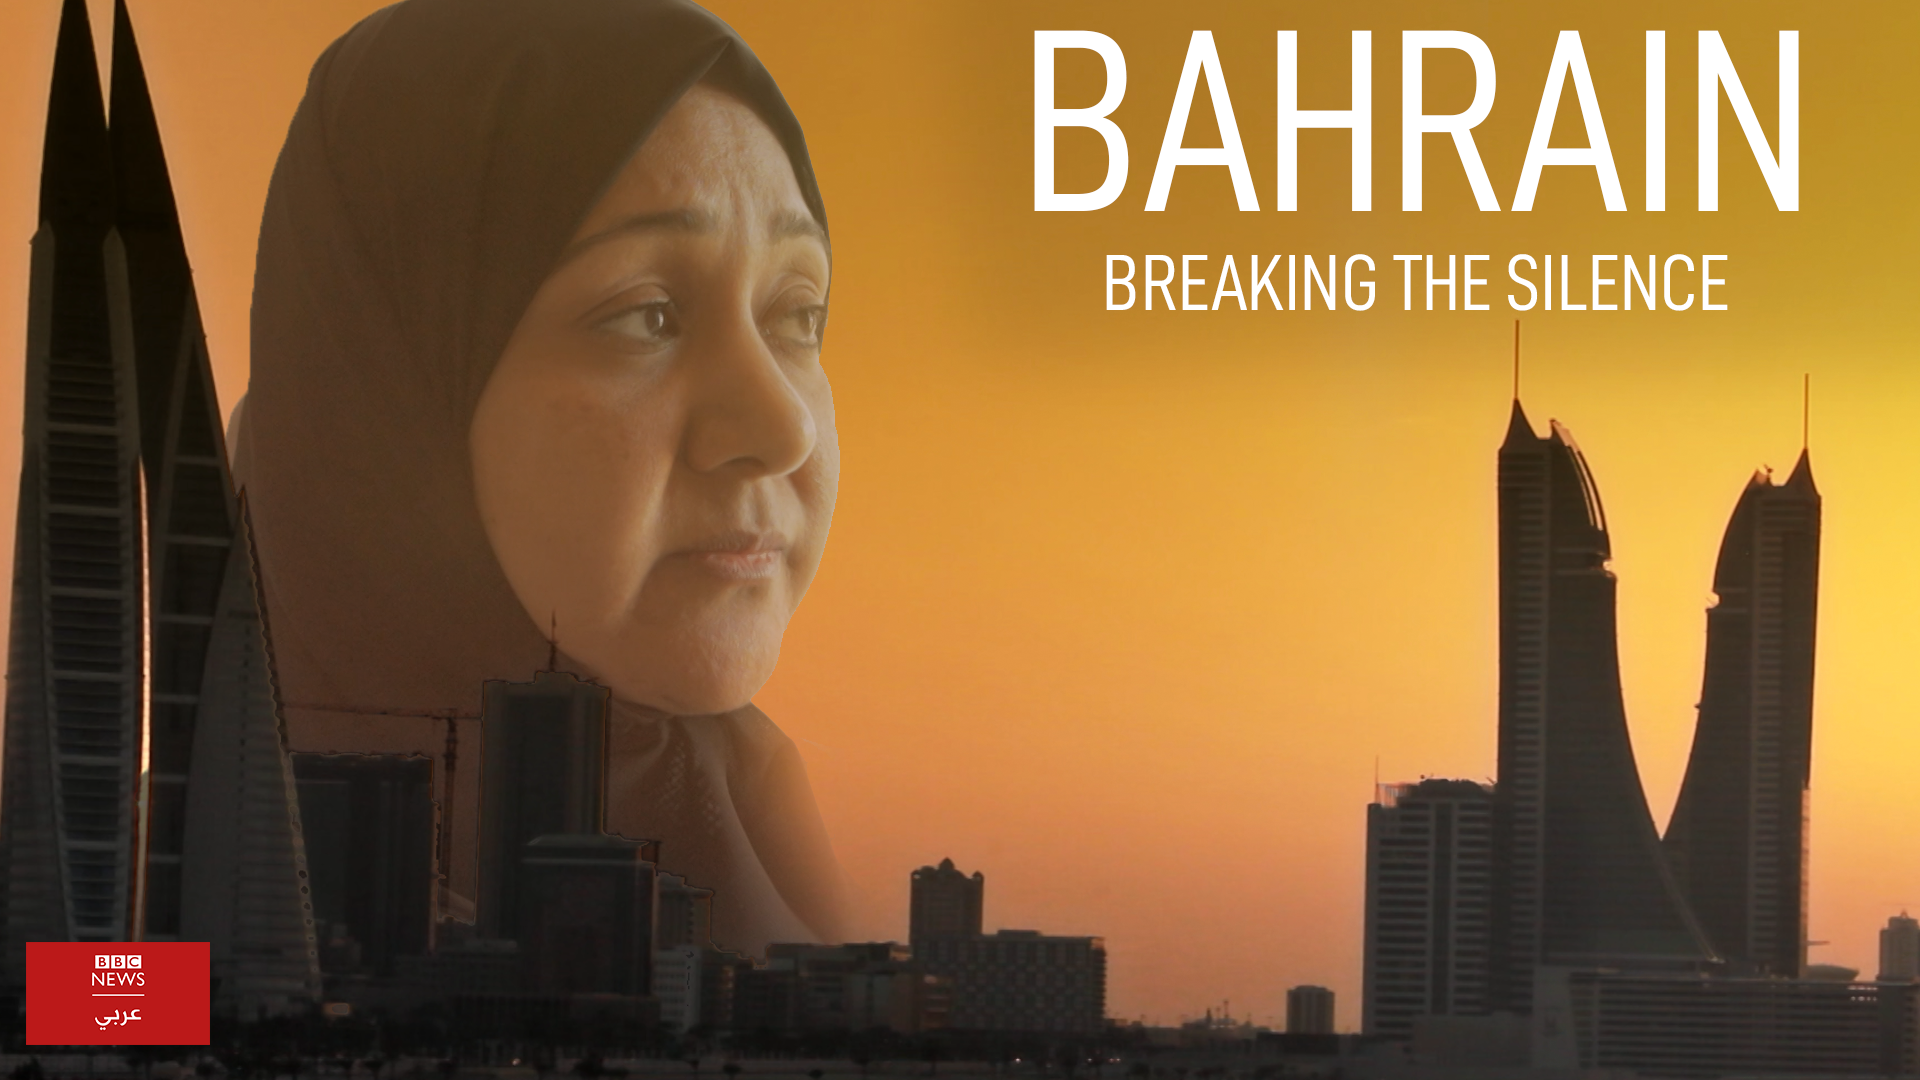 Bahrain: Breaking The Silence